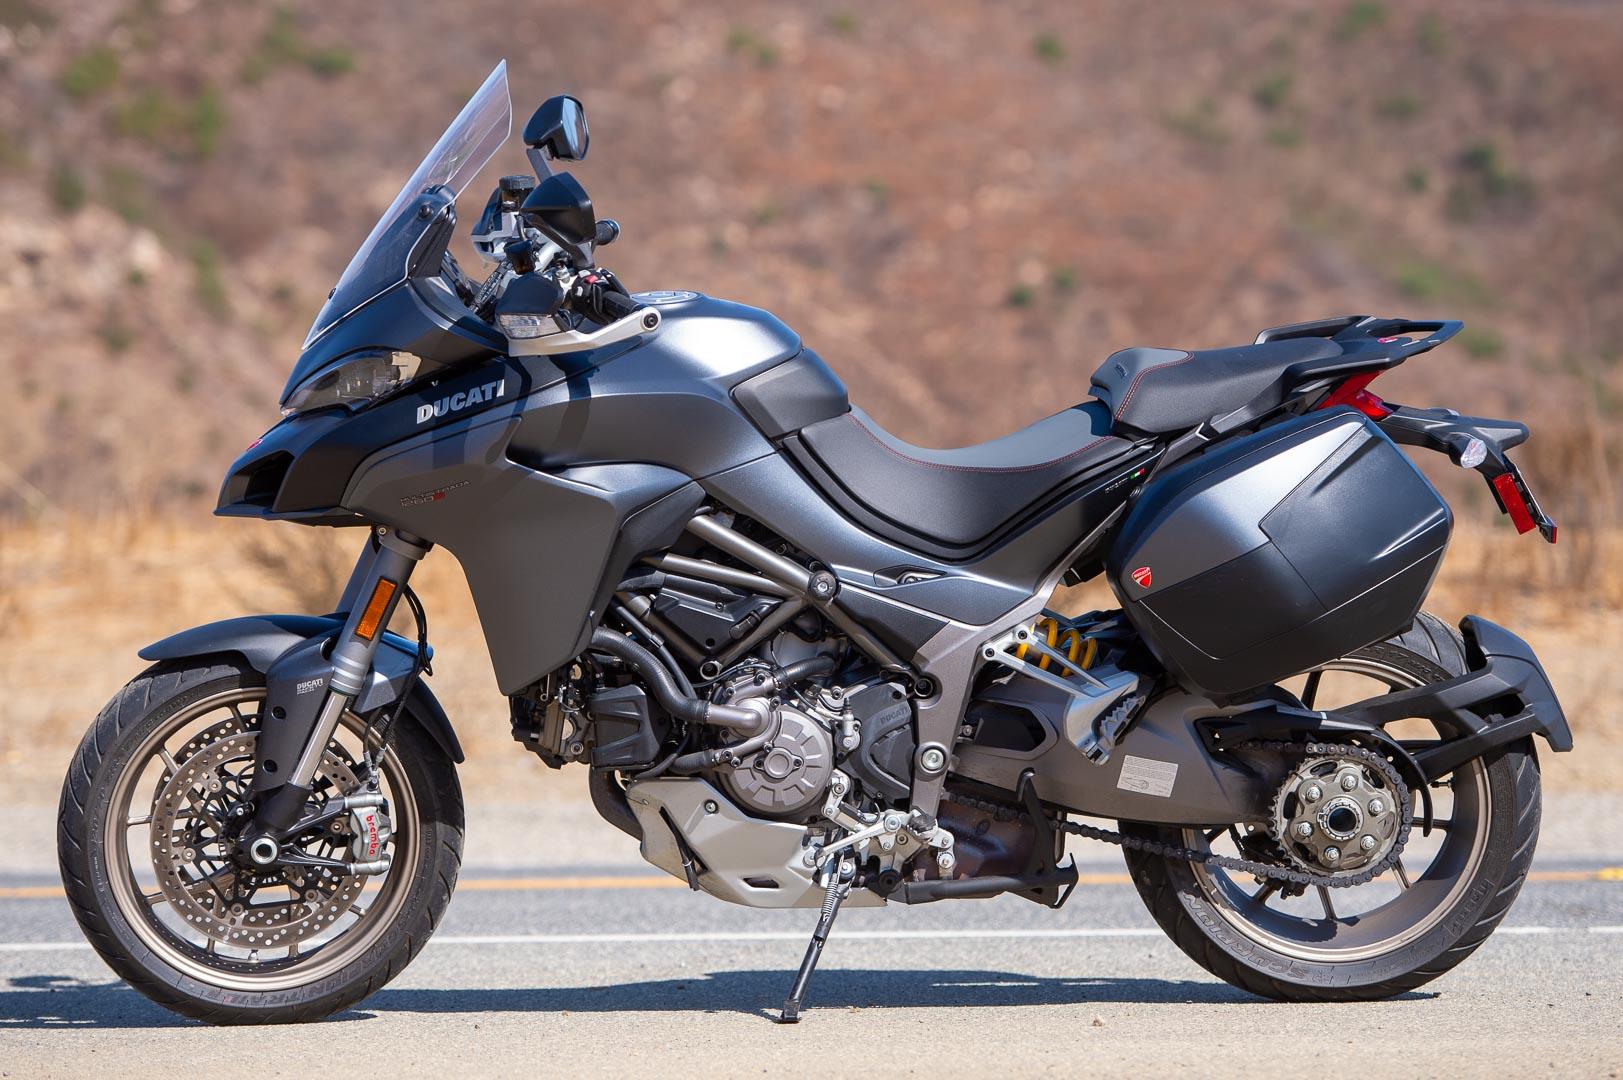 Ducati Multistrada 1200 Enduro Pro Is For Professionals To